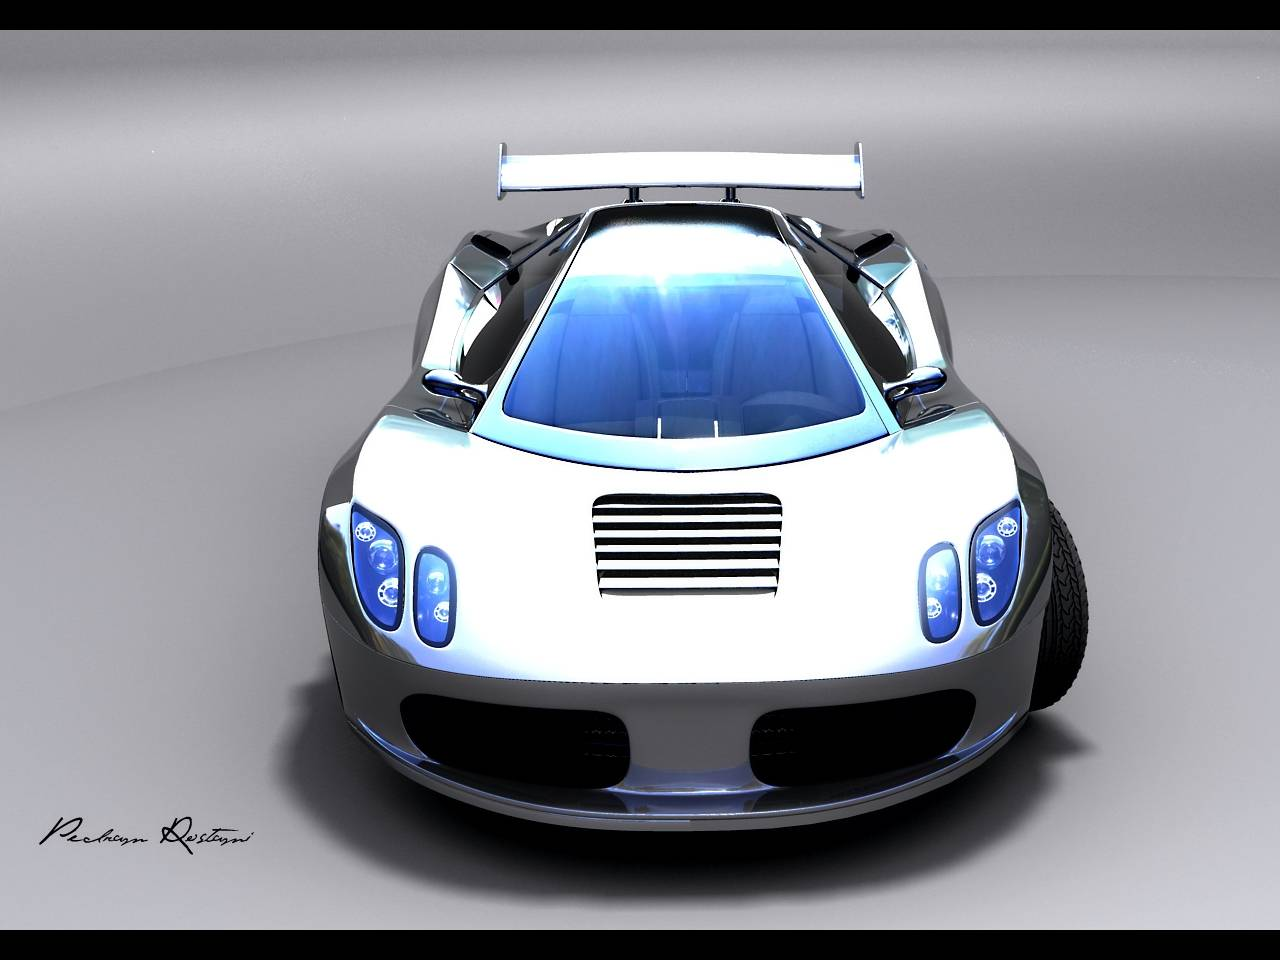 2007 Ferrari Adonai F 800 Concept Design by Pedram Rostami Kaliteli Wallpaper For Iphone